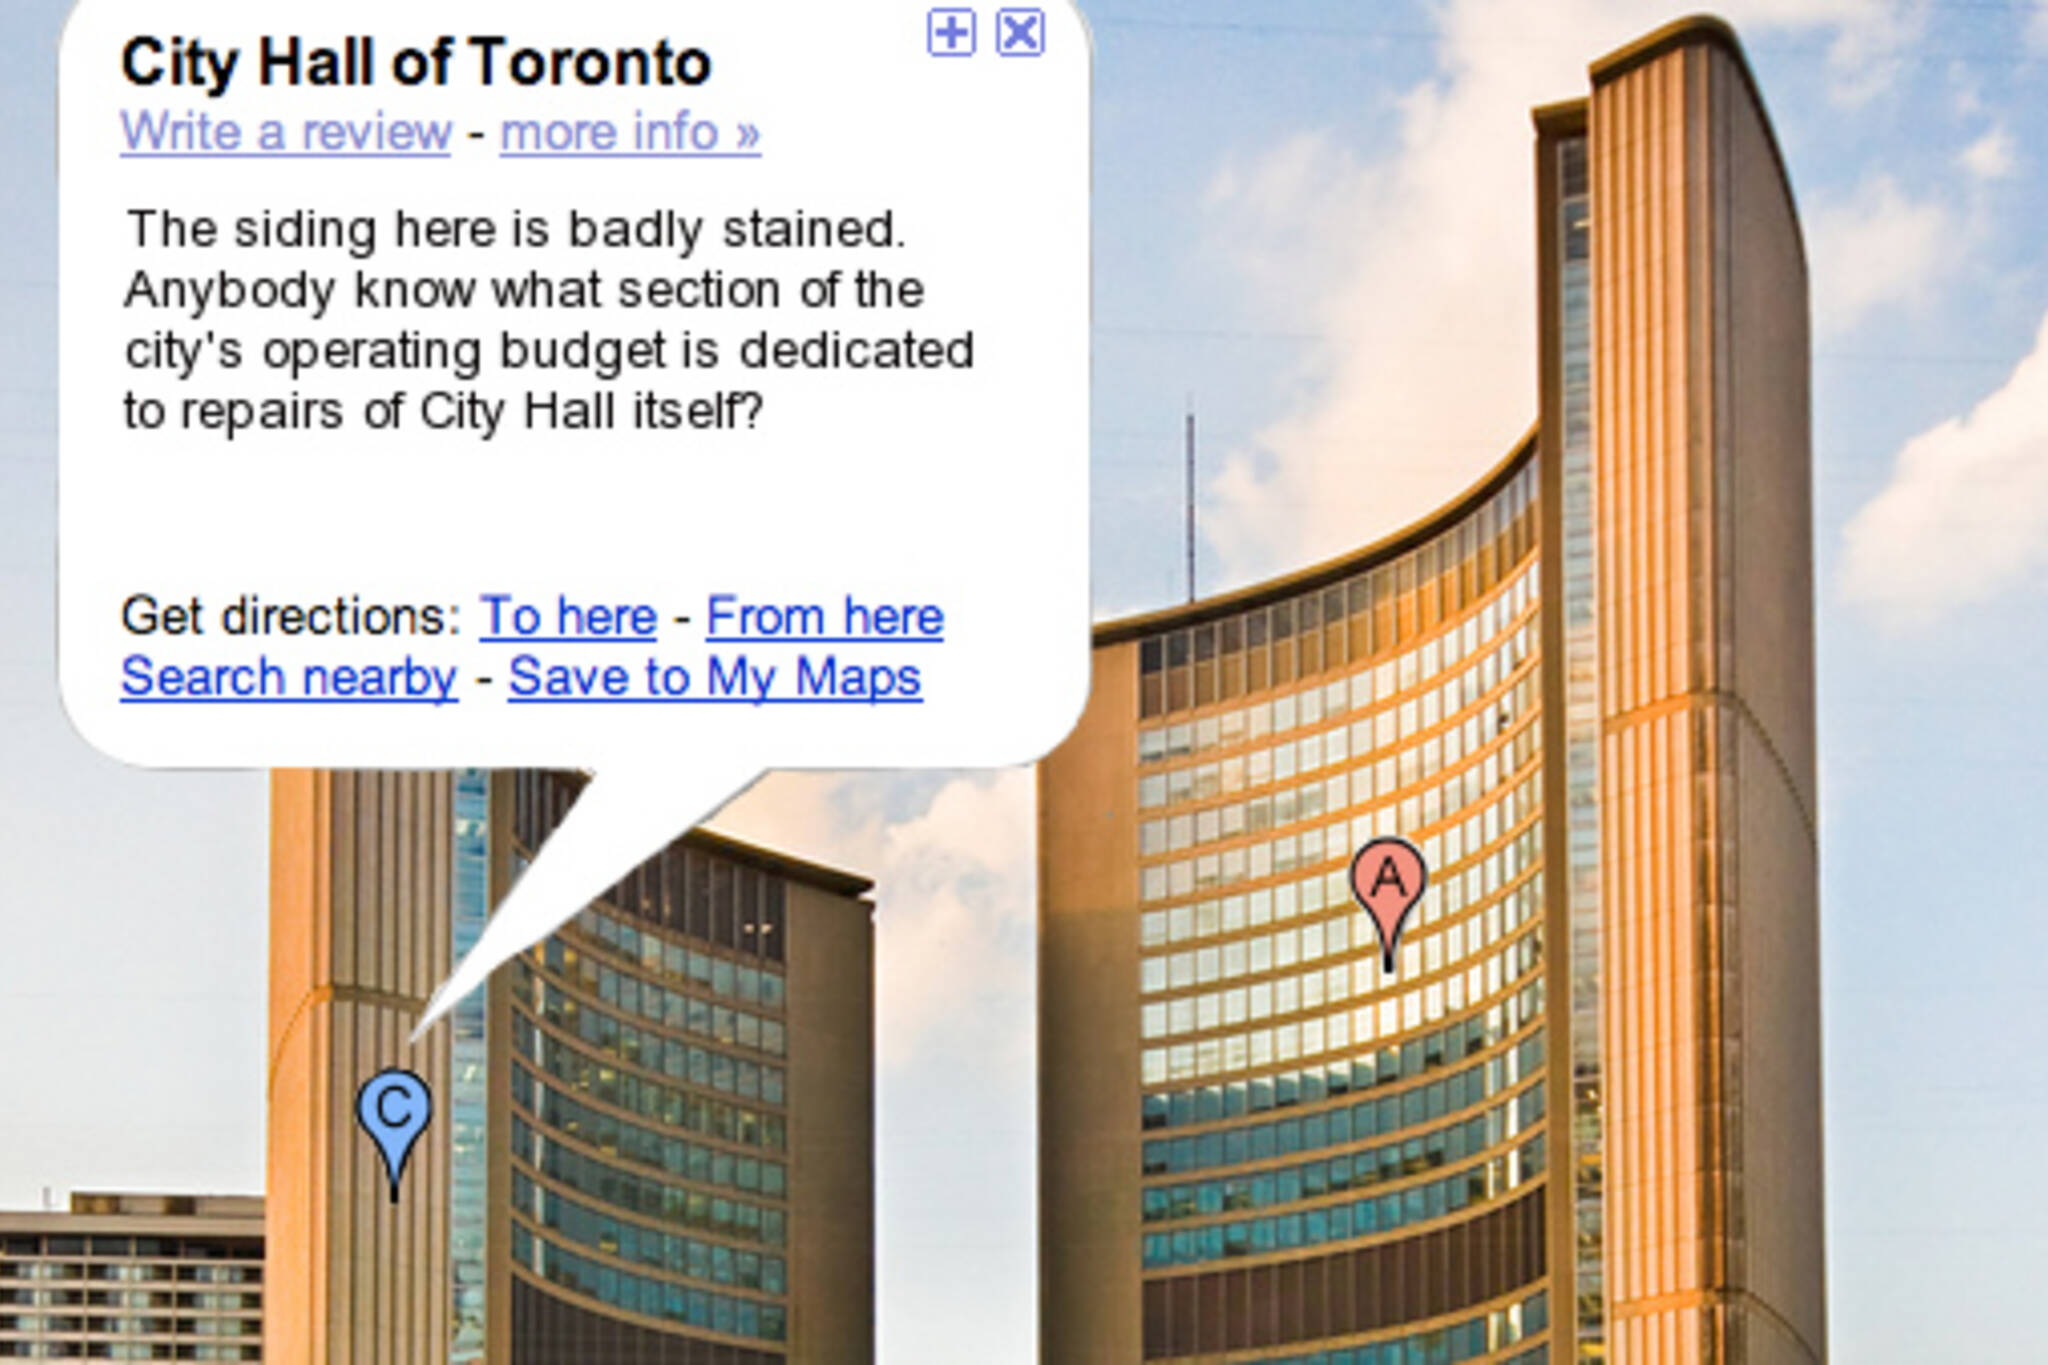 cityhall_11032009.jpg